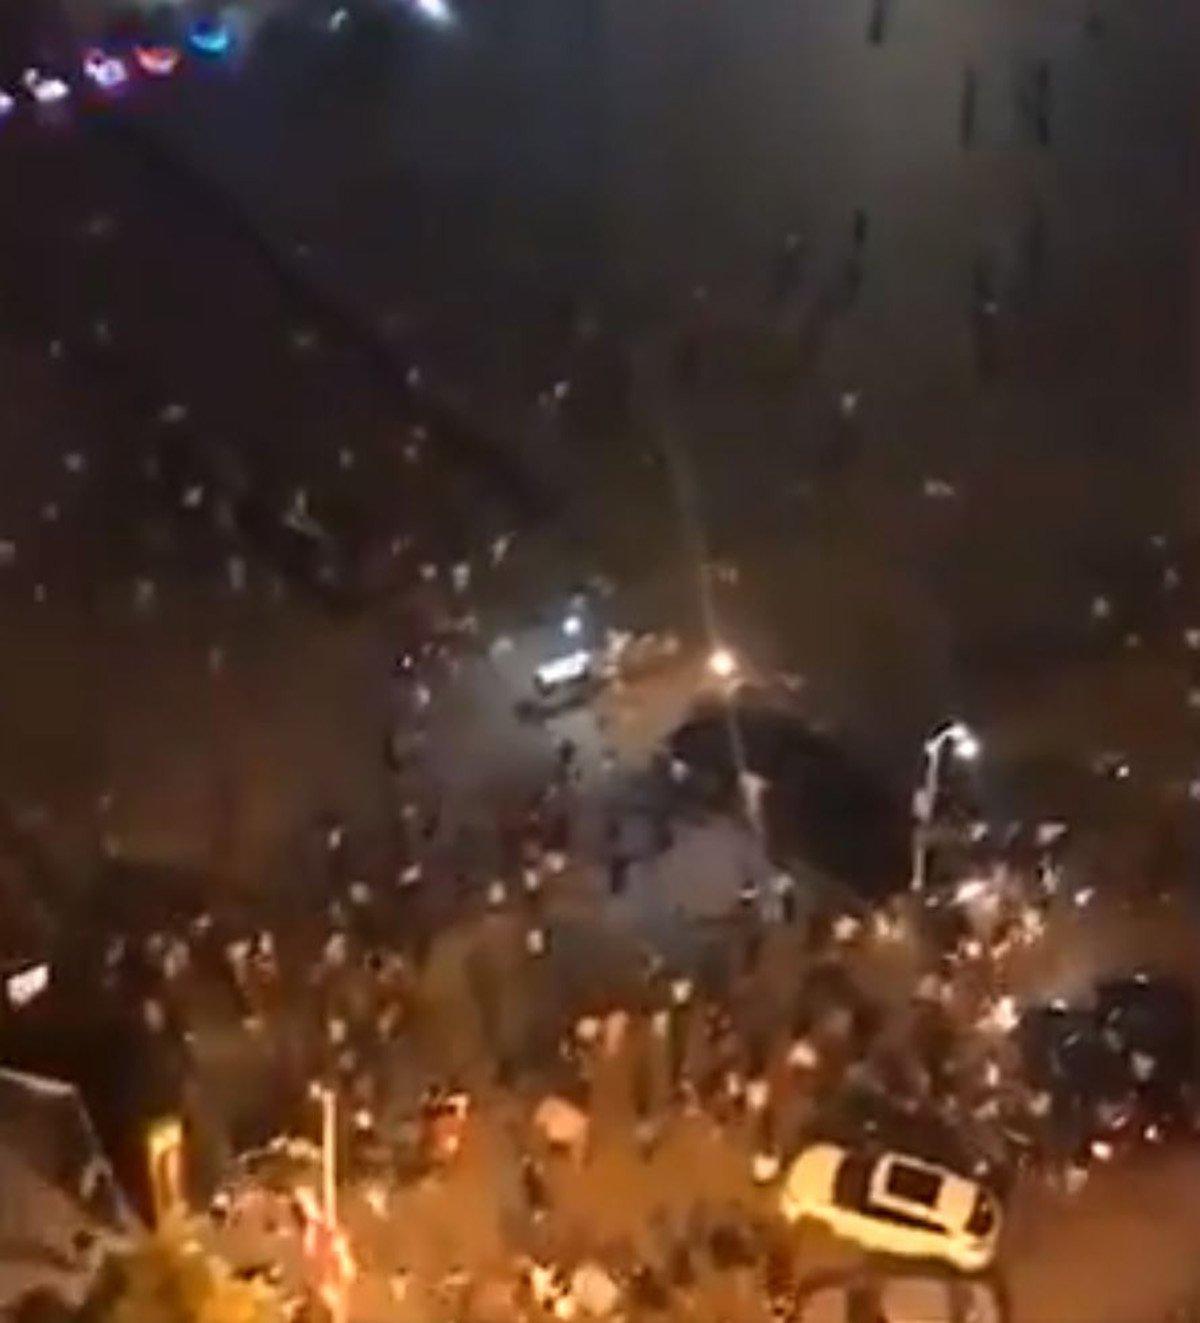 METRO GRAB - taken from tvlanguedoc Twitter no permission Car crash China Hengyang https://twitter.com/tvlanguedoc/status/1039903550422310912 tvlanguedoc